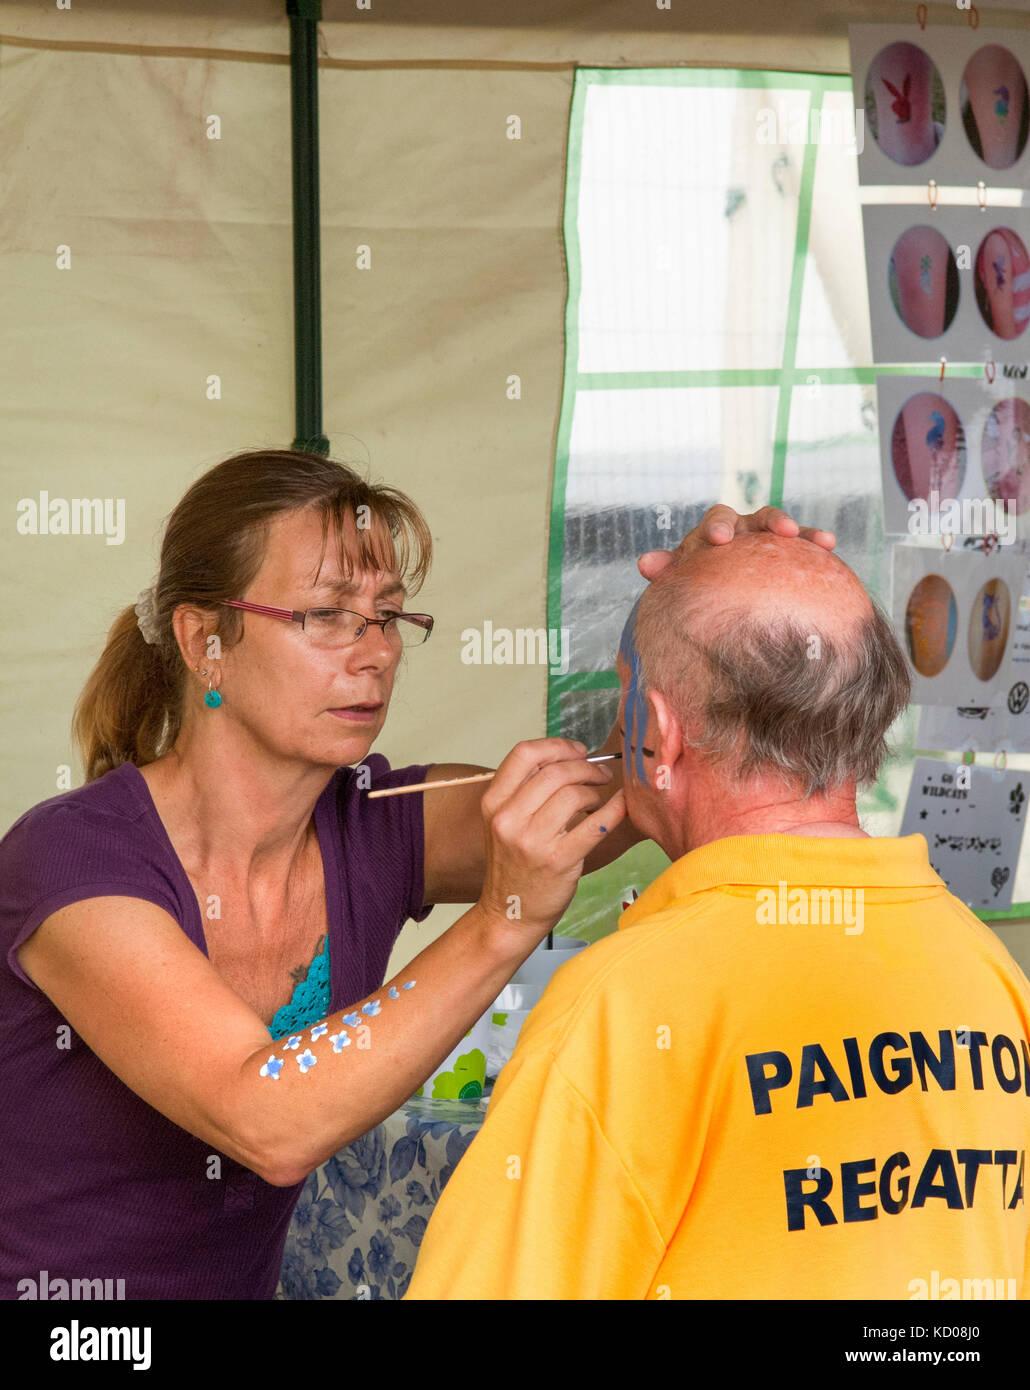 Older Lady Face Painting A Balding Man Staff At Paignton Regatta